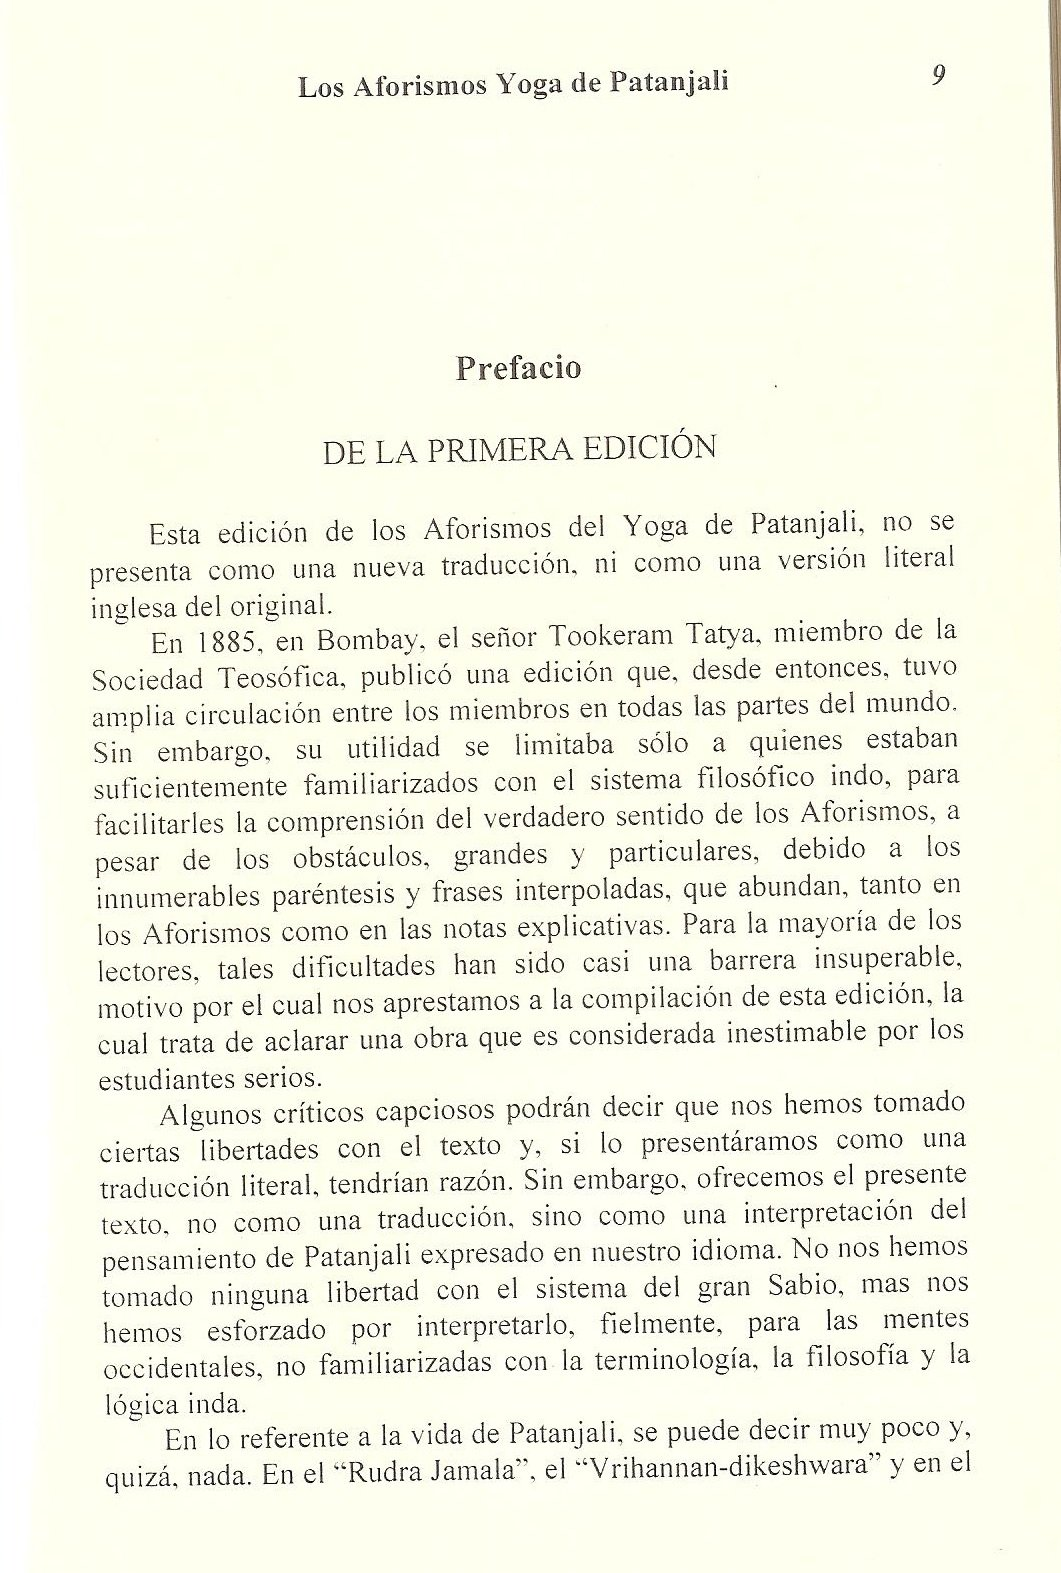 Los Aforismos Yoga de Patanjali. (Spanish Edition): Una interpretacion de W. Q. Judge, Berbera Editores: 9789685566438: Amazon.com: Books